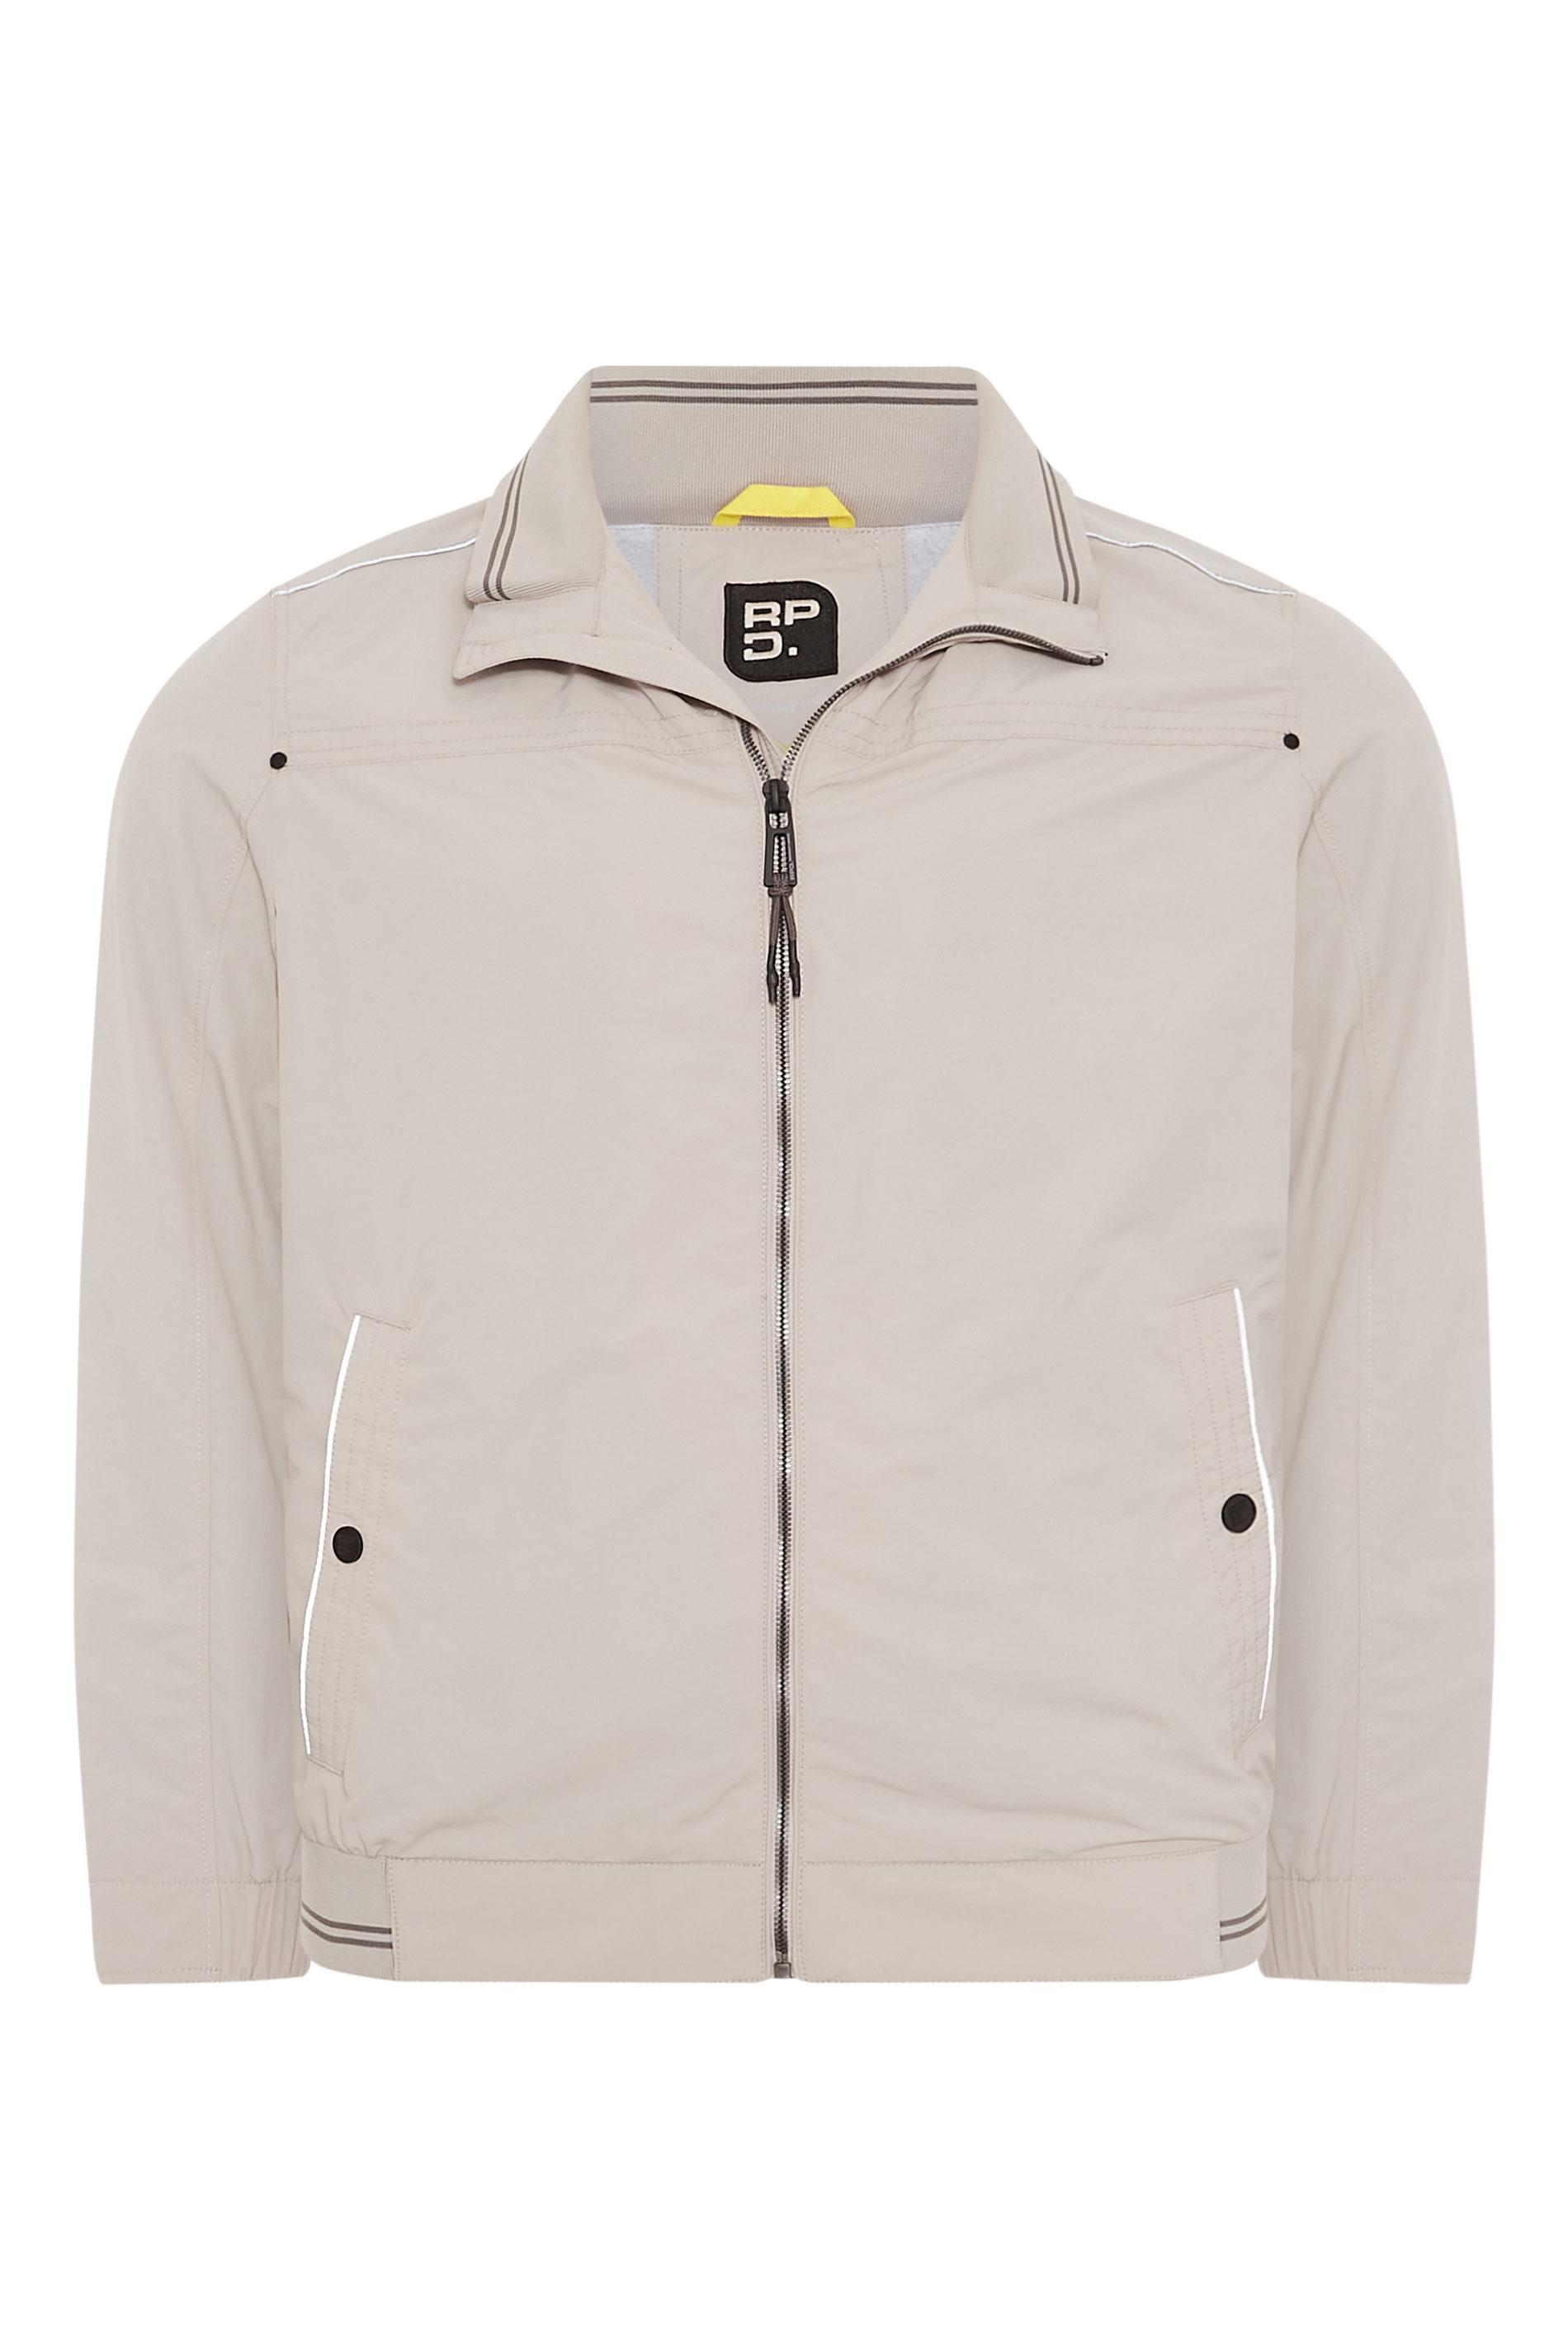 REDPOINT Stone Jacket